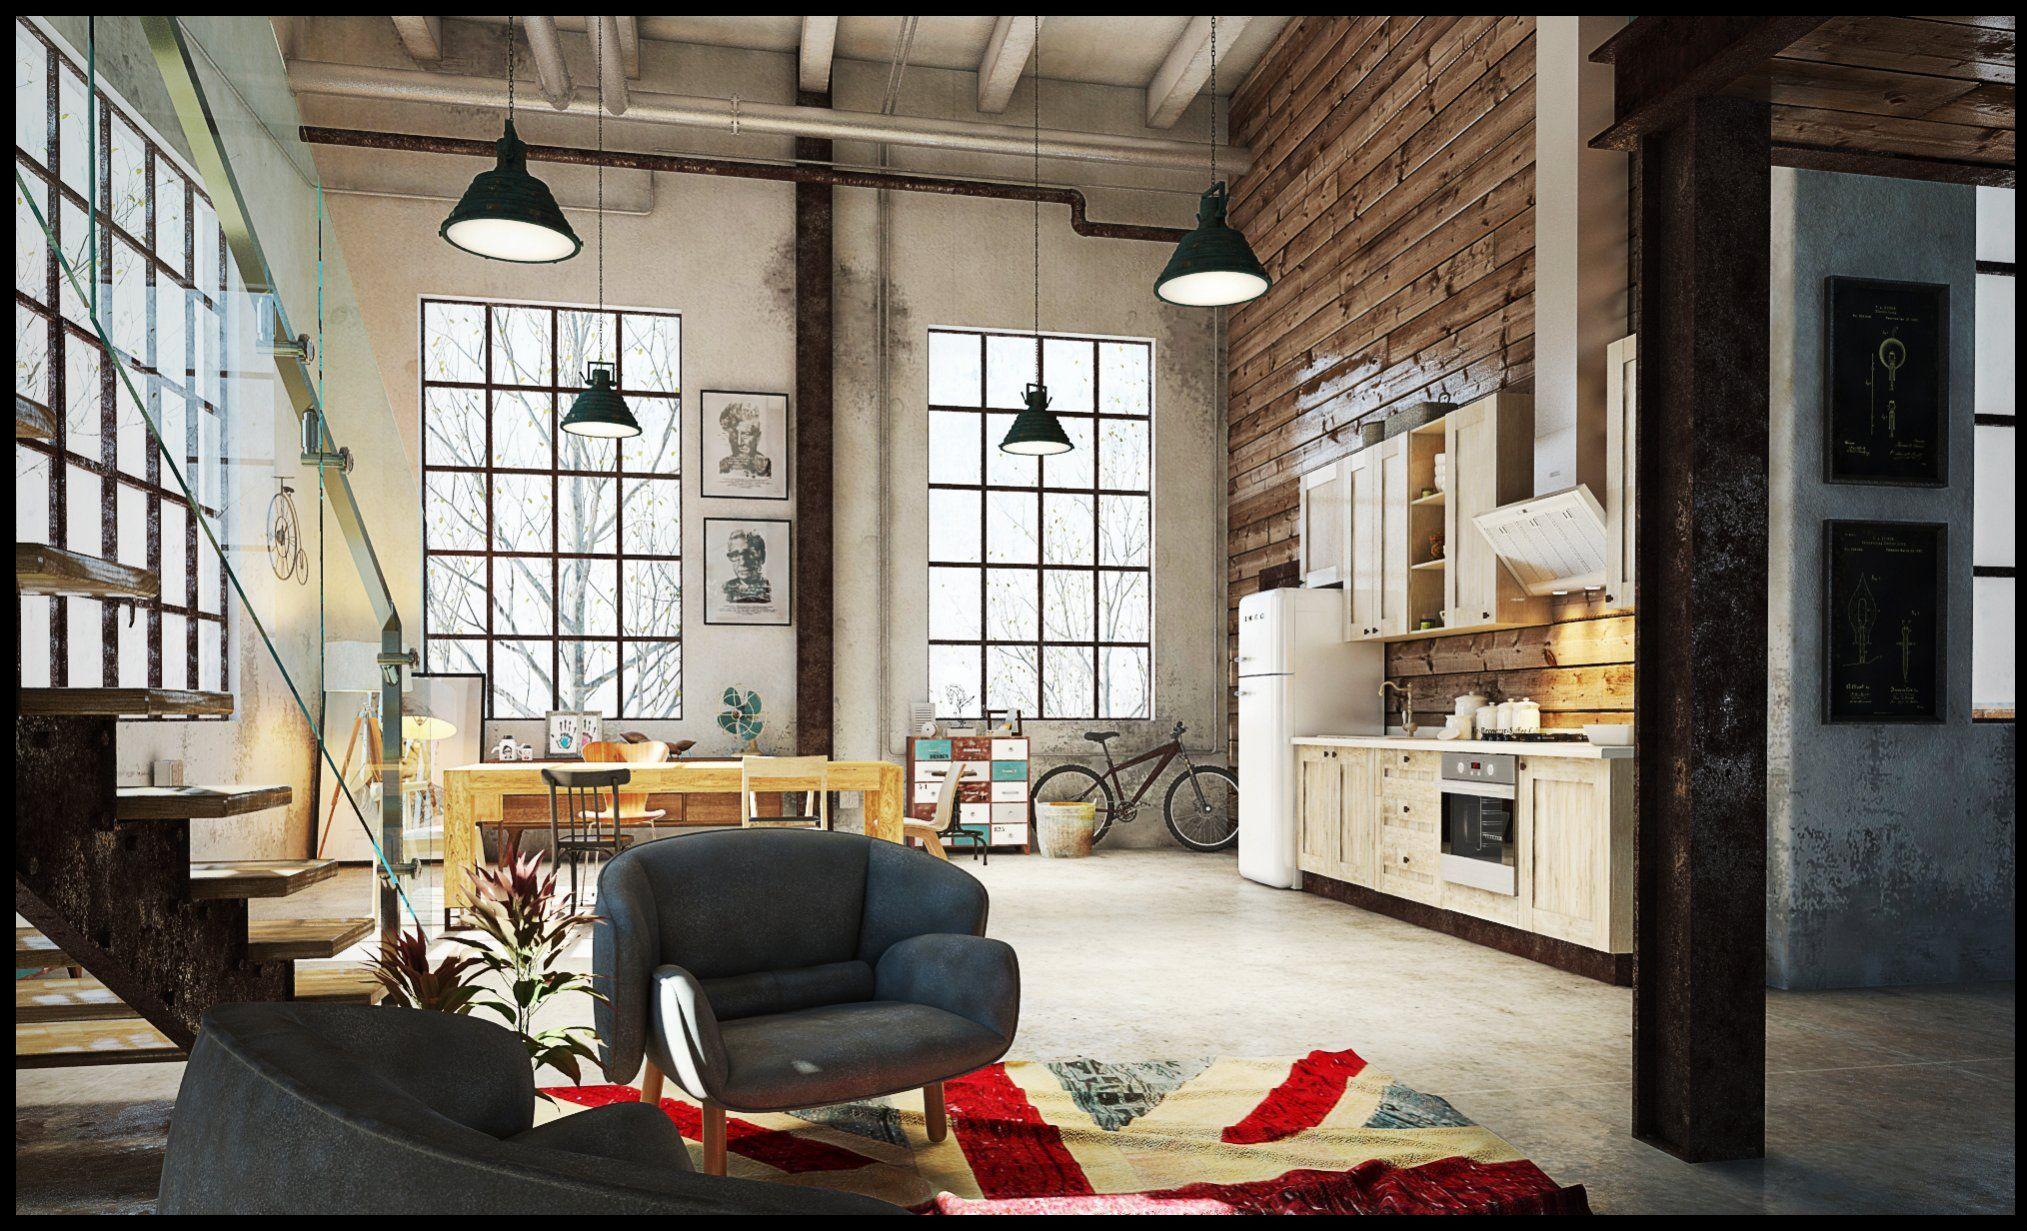 Fenster Loft loft challenge render posted by alovera on evermotion challenge